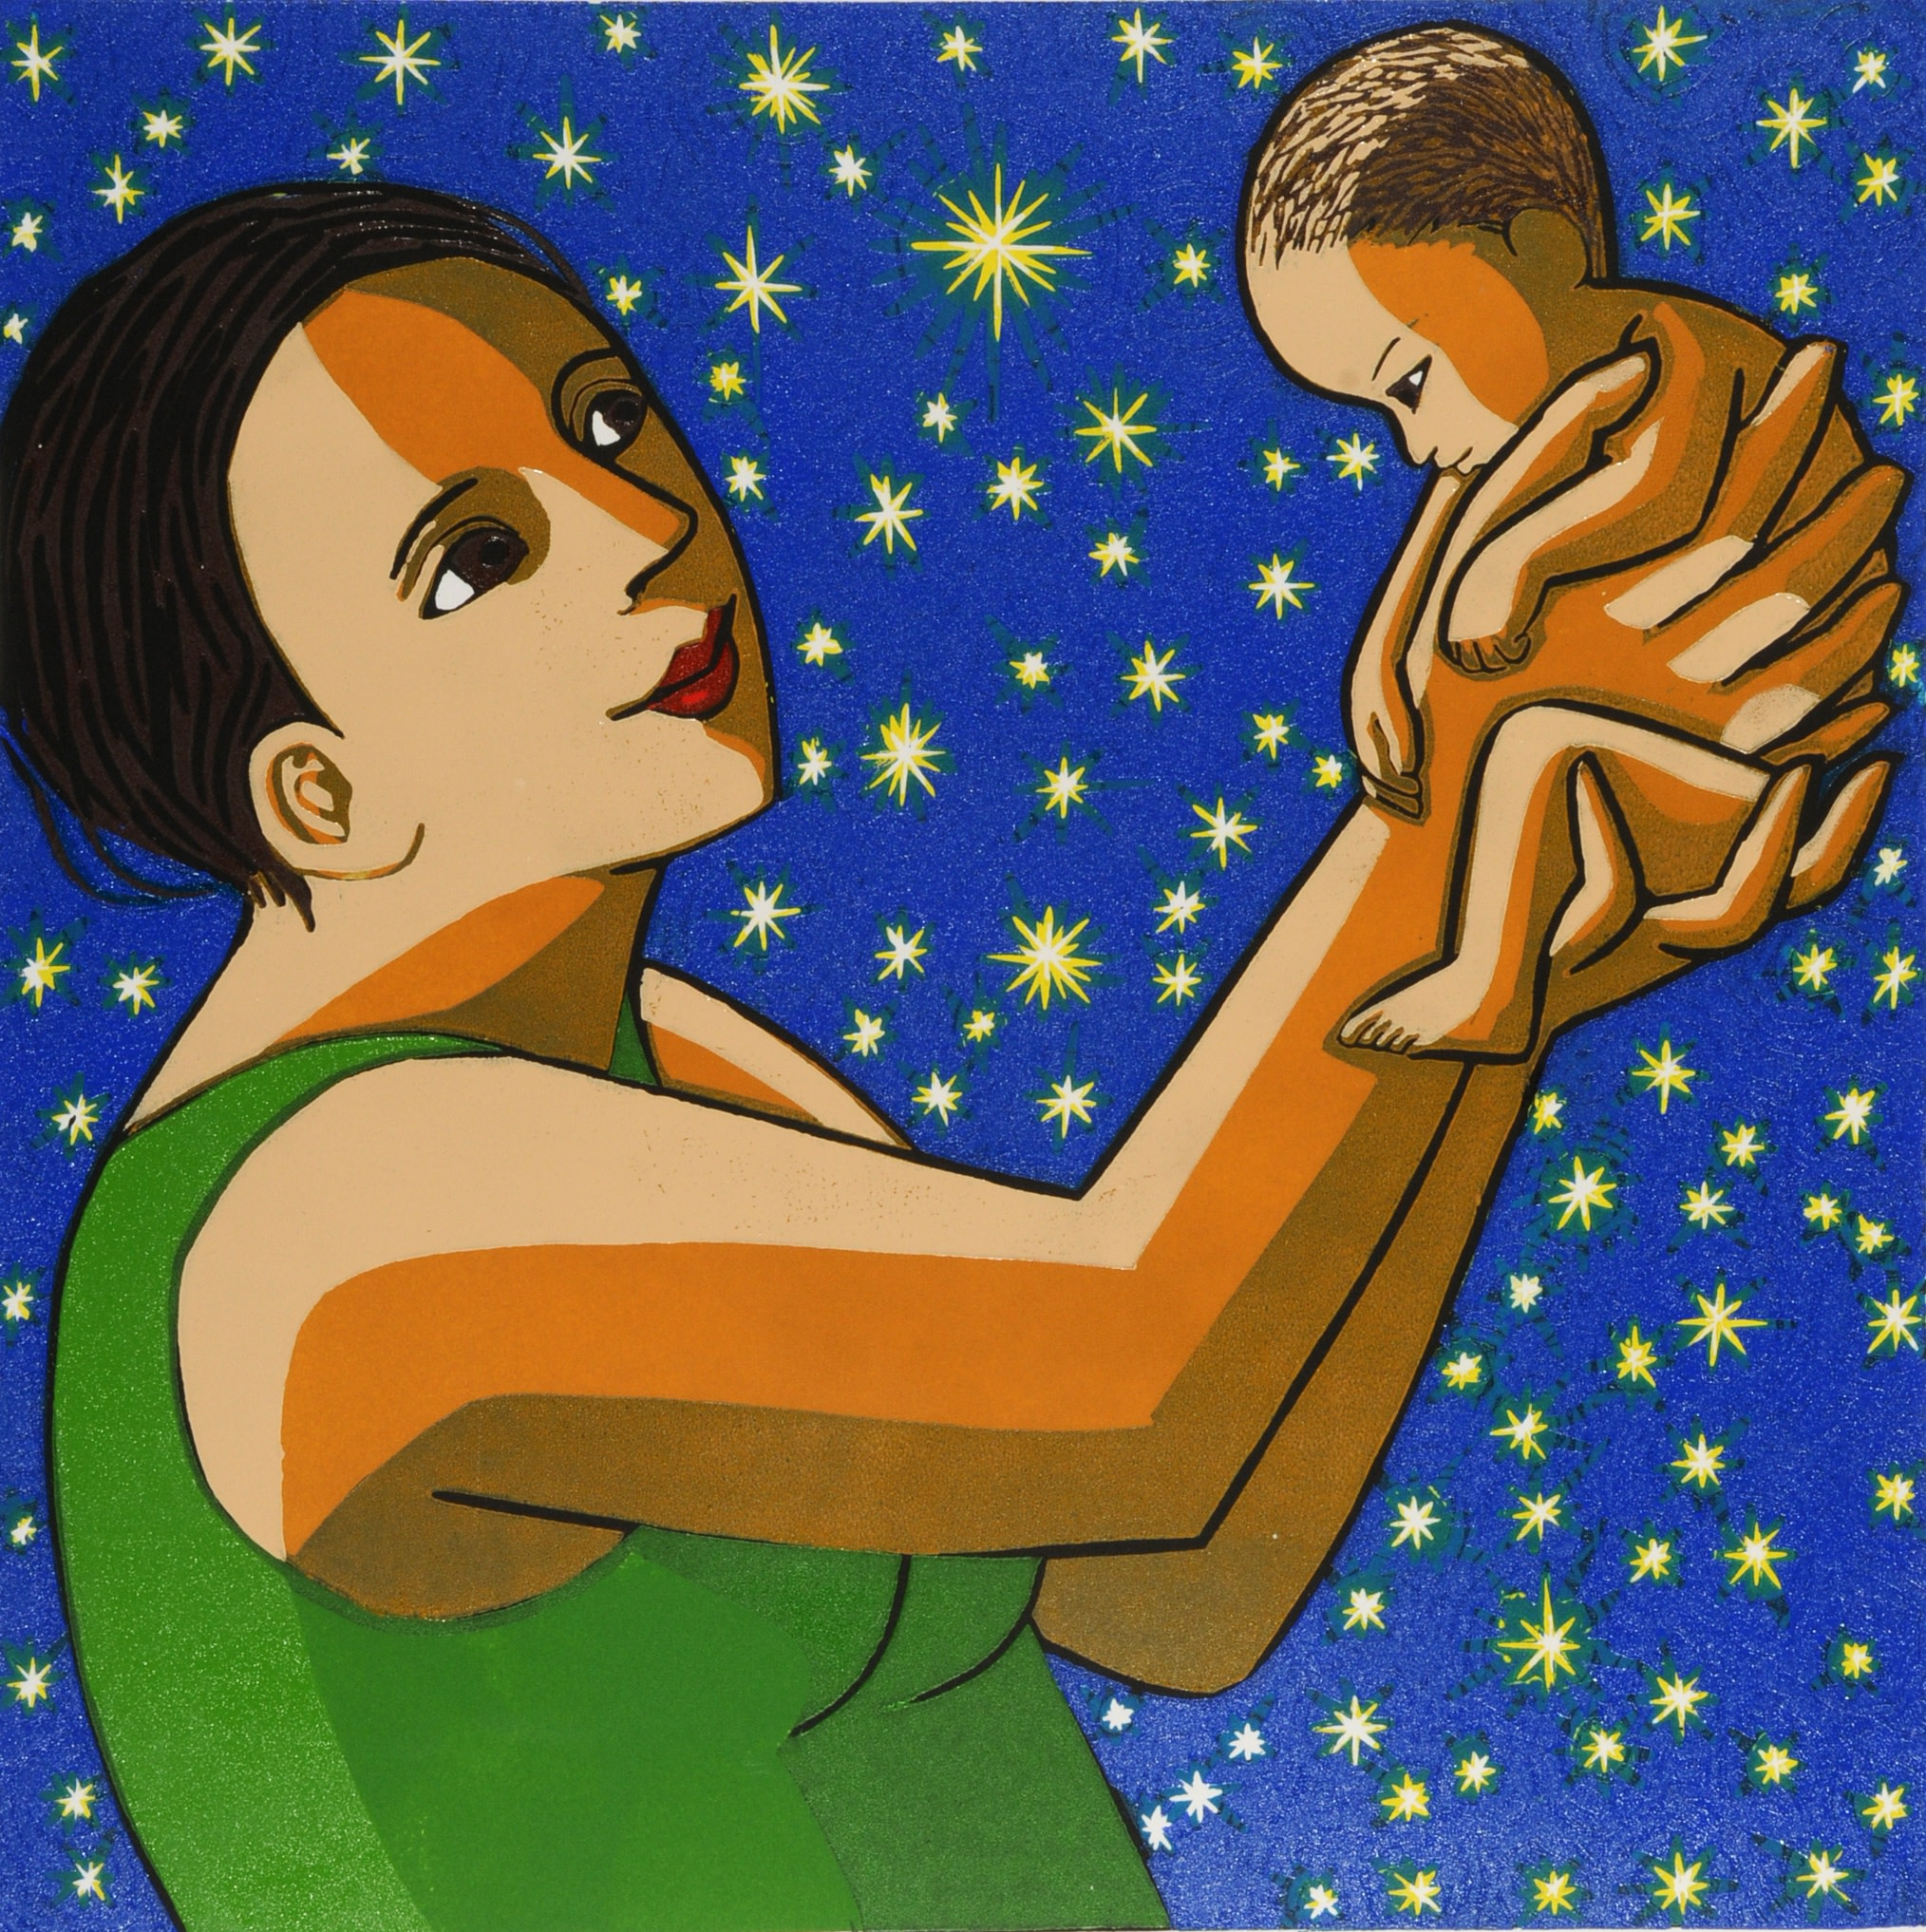 "<span class=""link fancybox-details-link""><a href=""/exhibitions/22/works/artworks_standalone11063/"">View Detail Page</a></span><div class=""artist""><span class=""artist""><strong>Anita Klein PPRE Hon RWS</strong></span></div><div class=""title""><em>The Miracle</em></div><div class=""medium"">linocut</div><div class=""dimensions"">66 x 65 cm framed size<br>45 x 45 cm image size</div><div class=""edition_details"">edition of 50</div>"